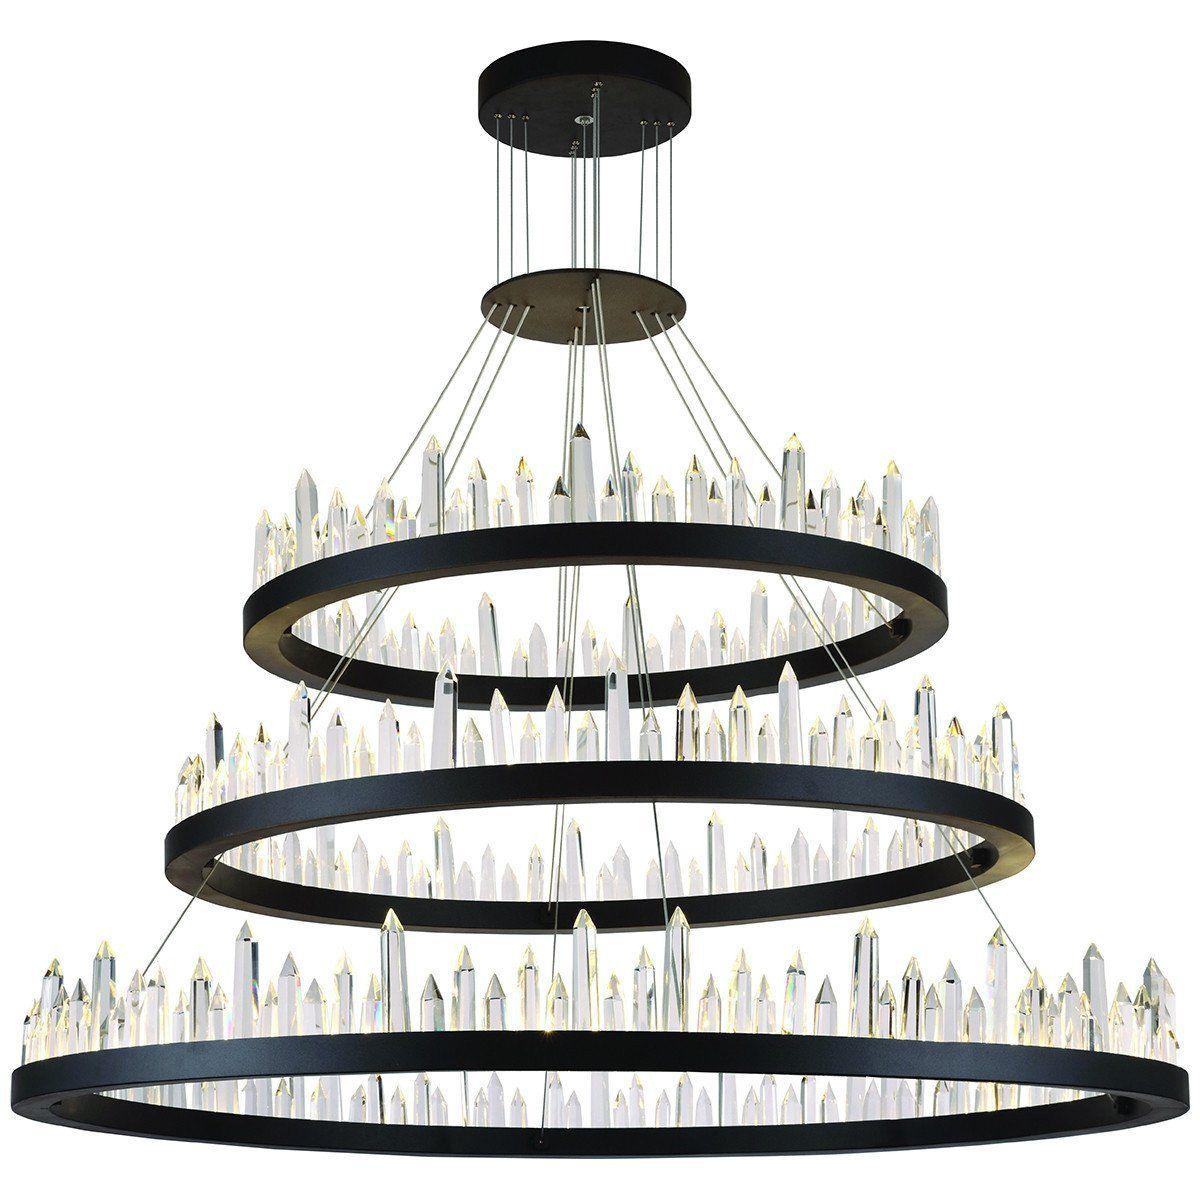 Elegant Lighting Malta Hang 3 Layers Led Satin Dark Grey Chandelier Grey Chandeliers